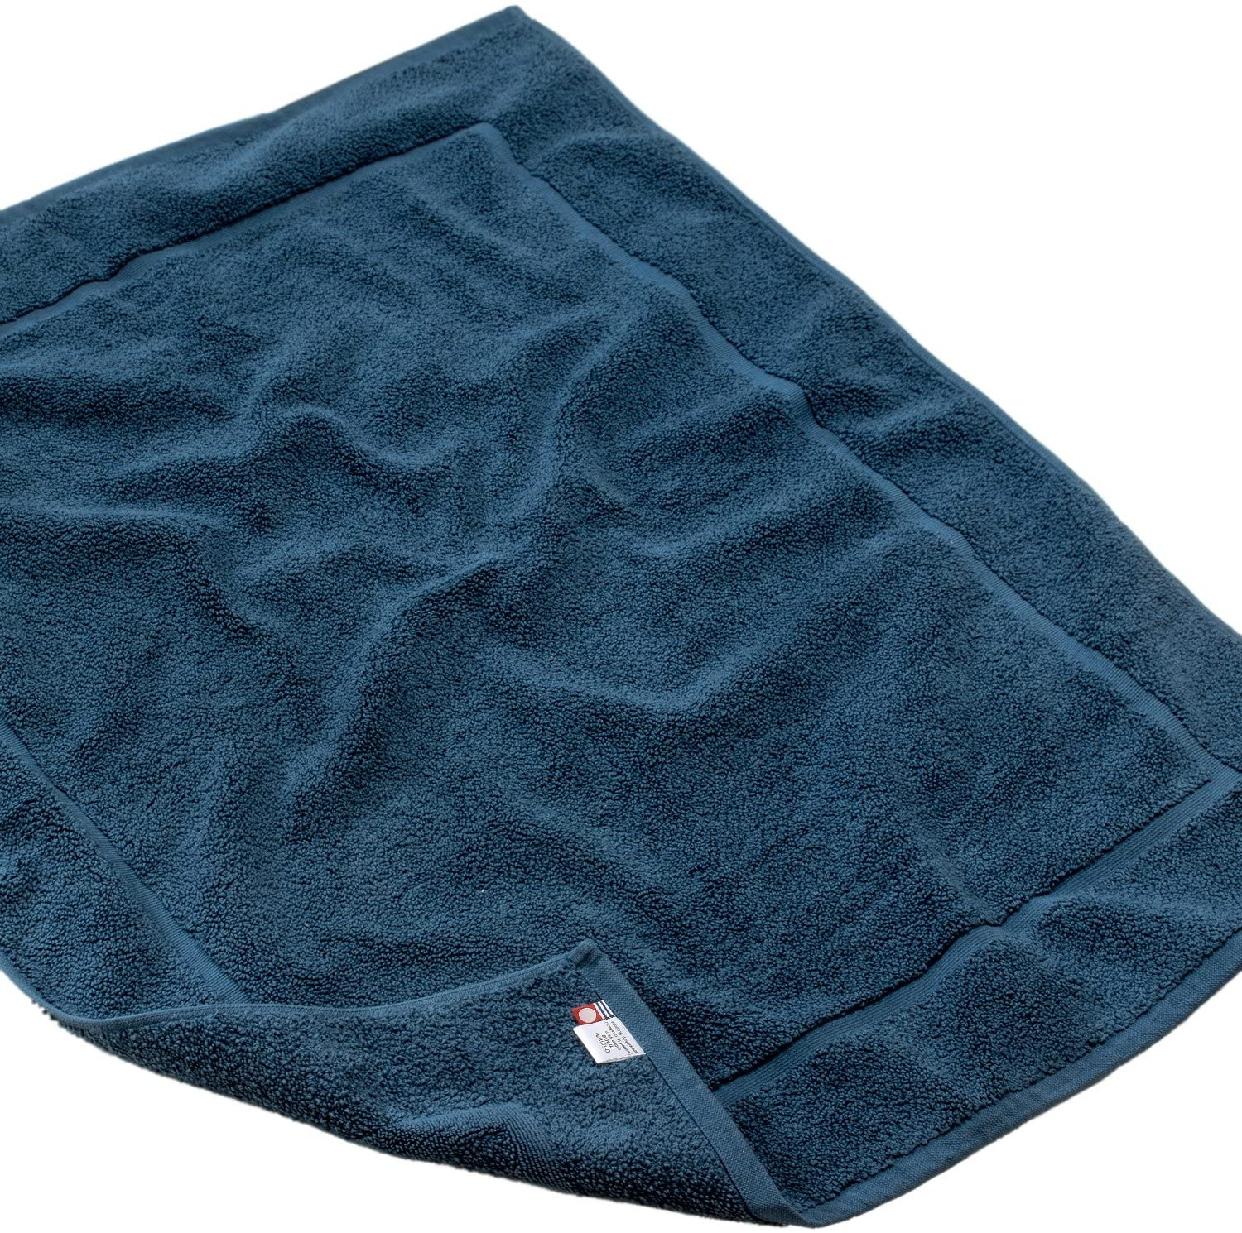 Broome(ブルーム)今治産 レオン 大判バスマットの商品画像2